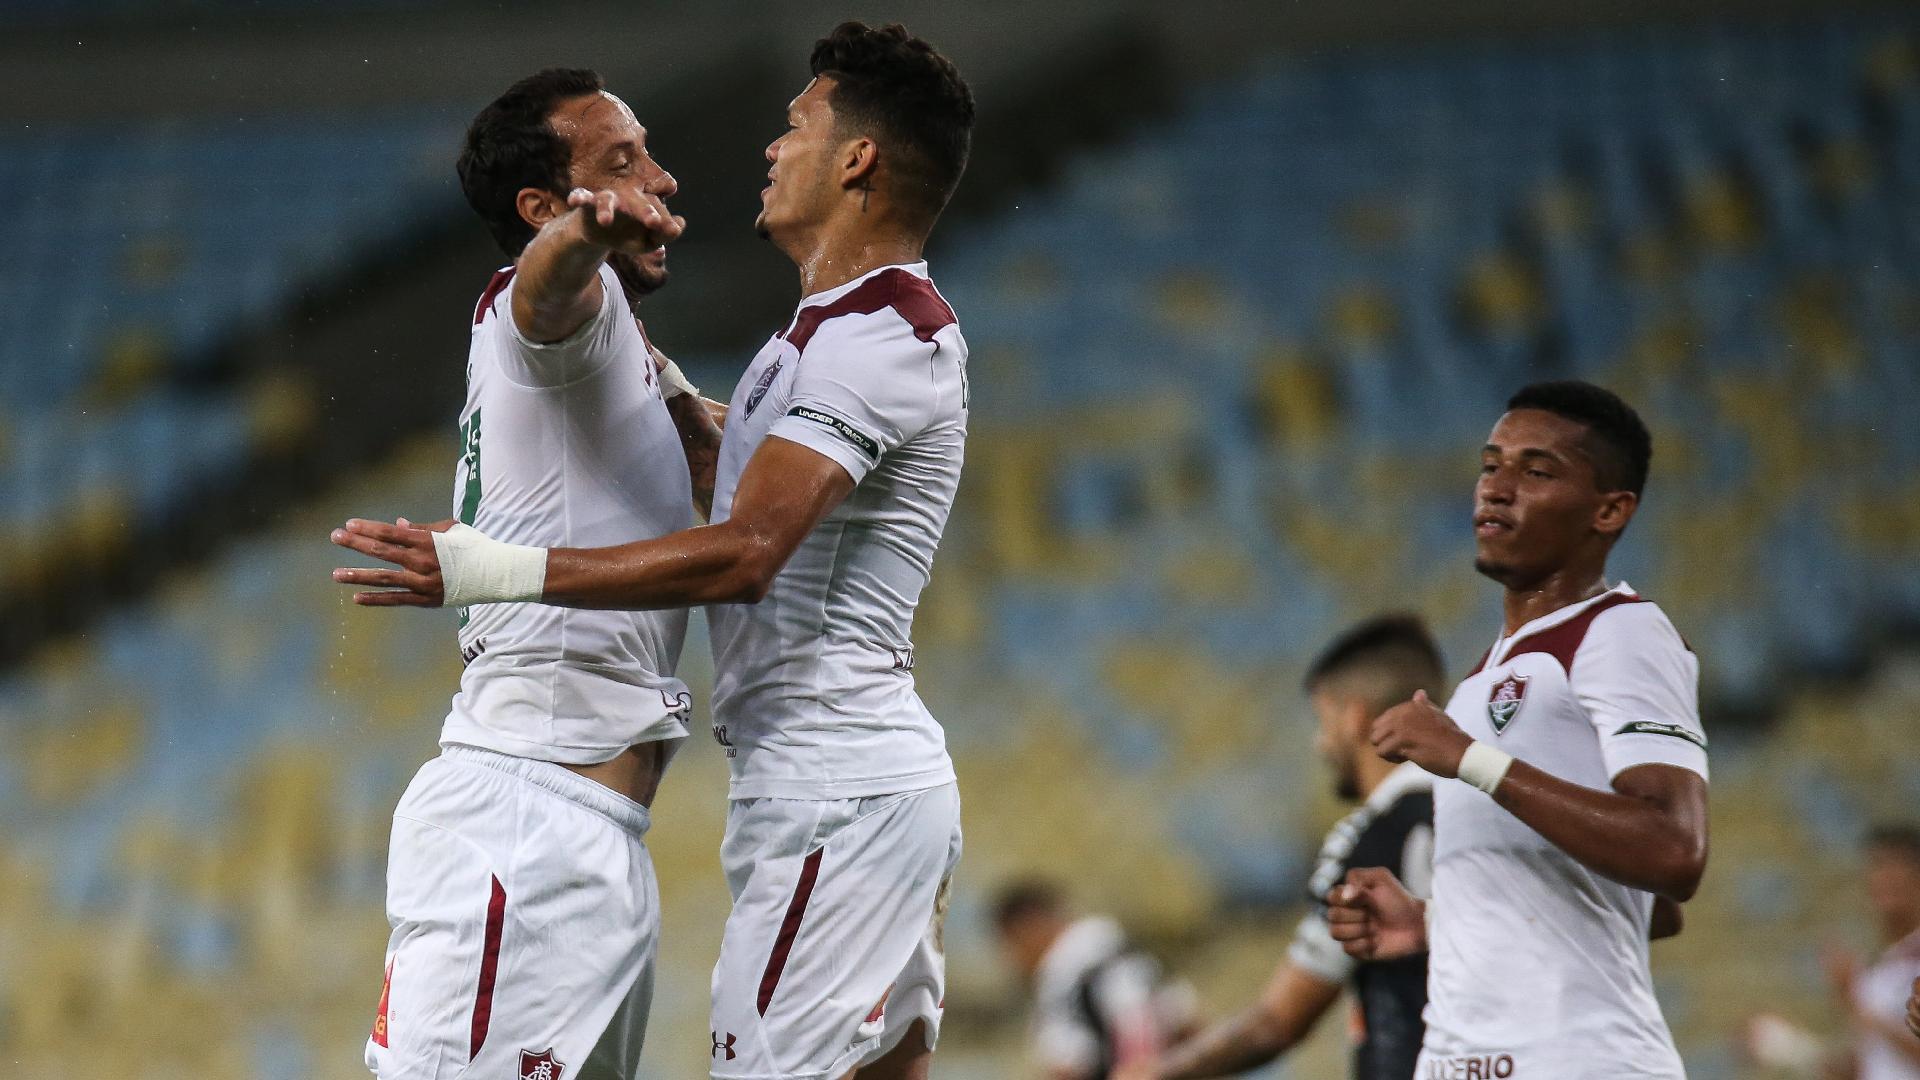 Evanilson e Nenê comemoram o primeiro gol do Fluminense